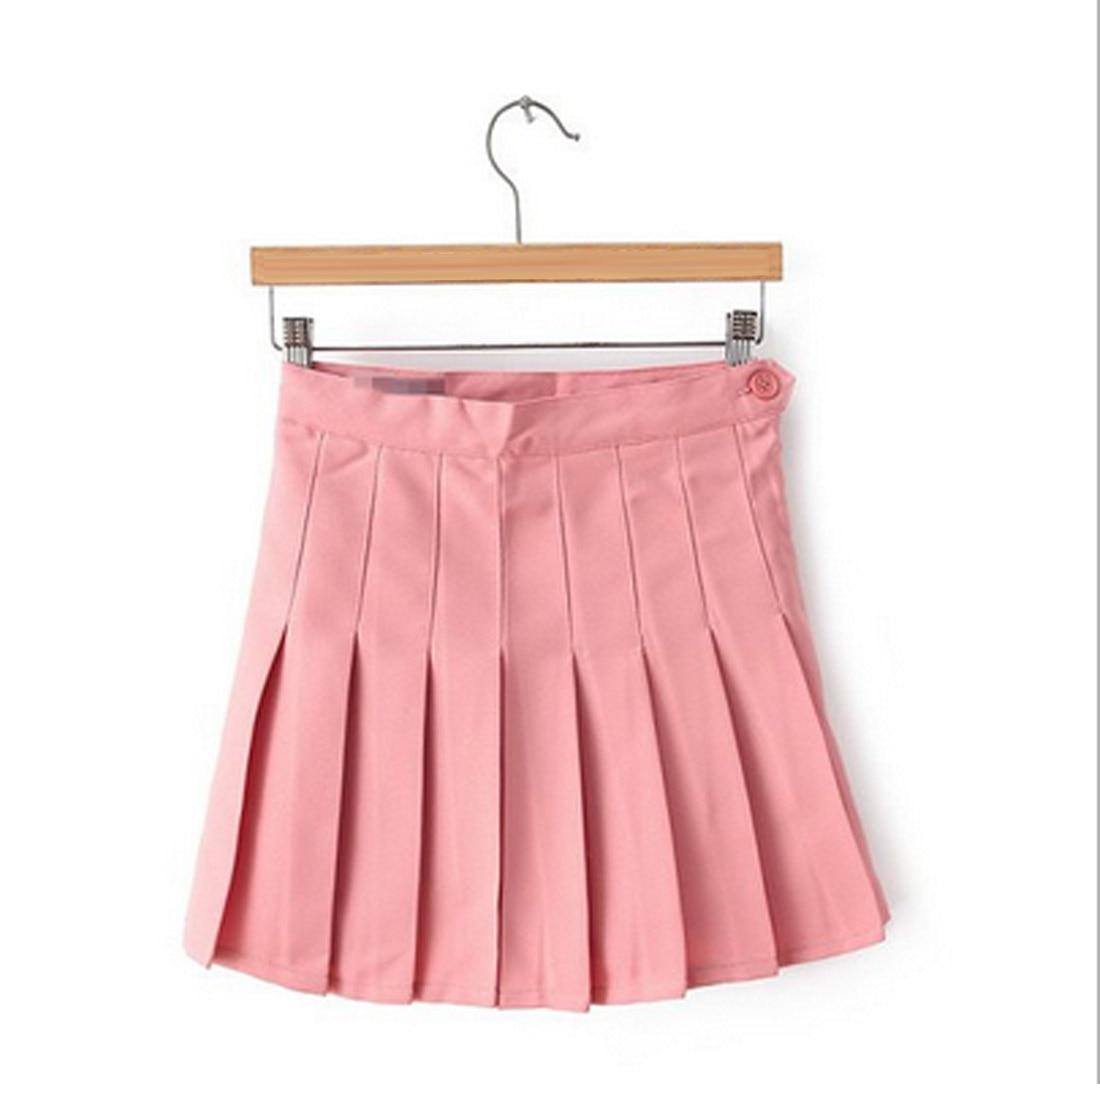 Ladies Sexy White Skirt Women Summer Skirts  2019 Korean Style Solid Color High Waist Skirt Plus Size Harajuku Women Mini Skirts